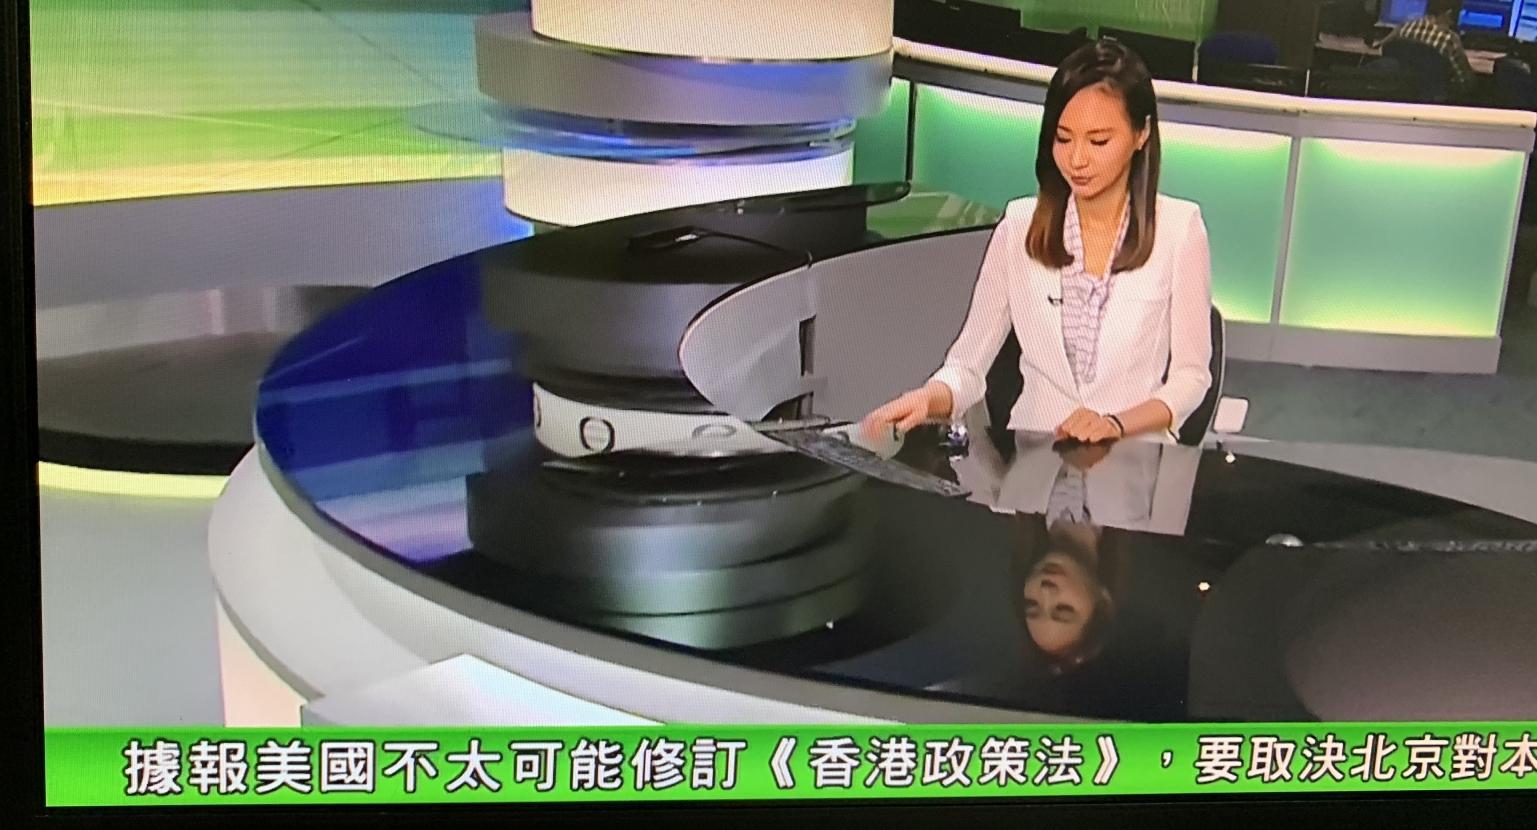 [img]https://upload.cc/i1/2019/06/15/oamTR9.png[/img]